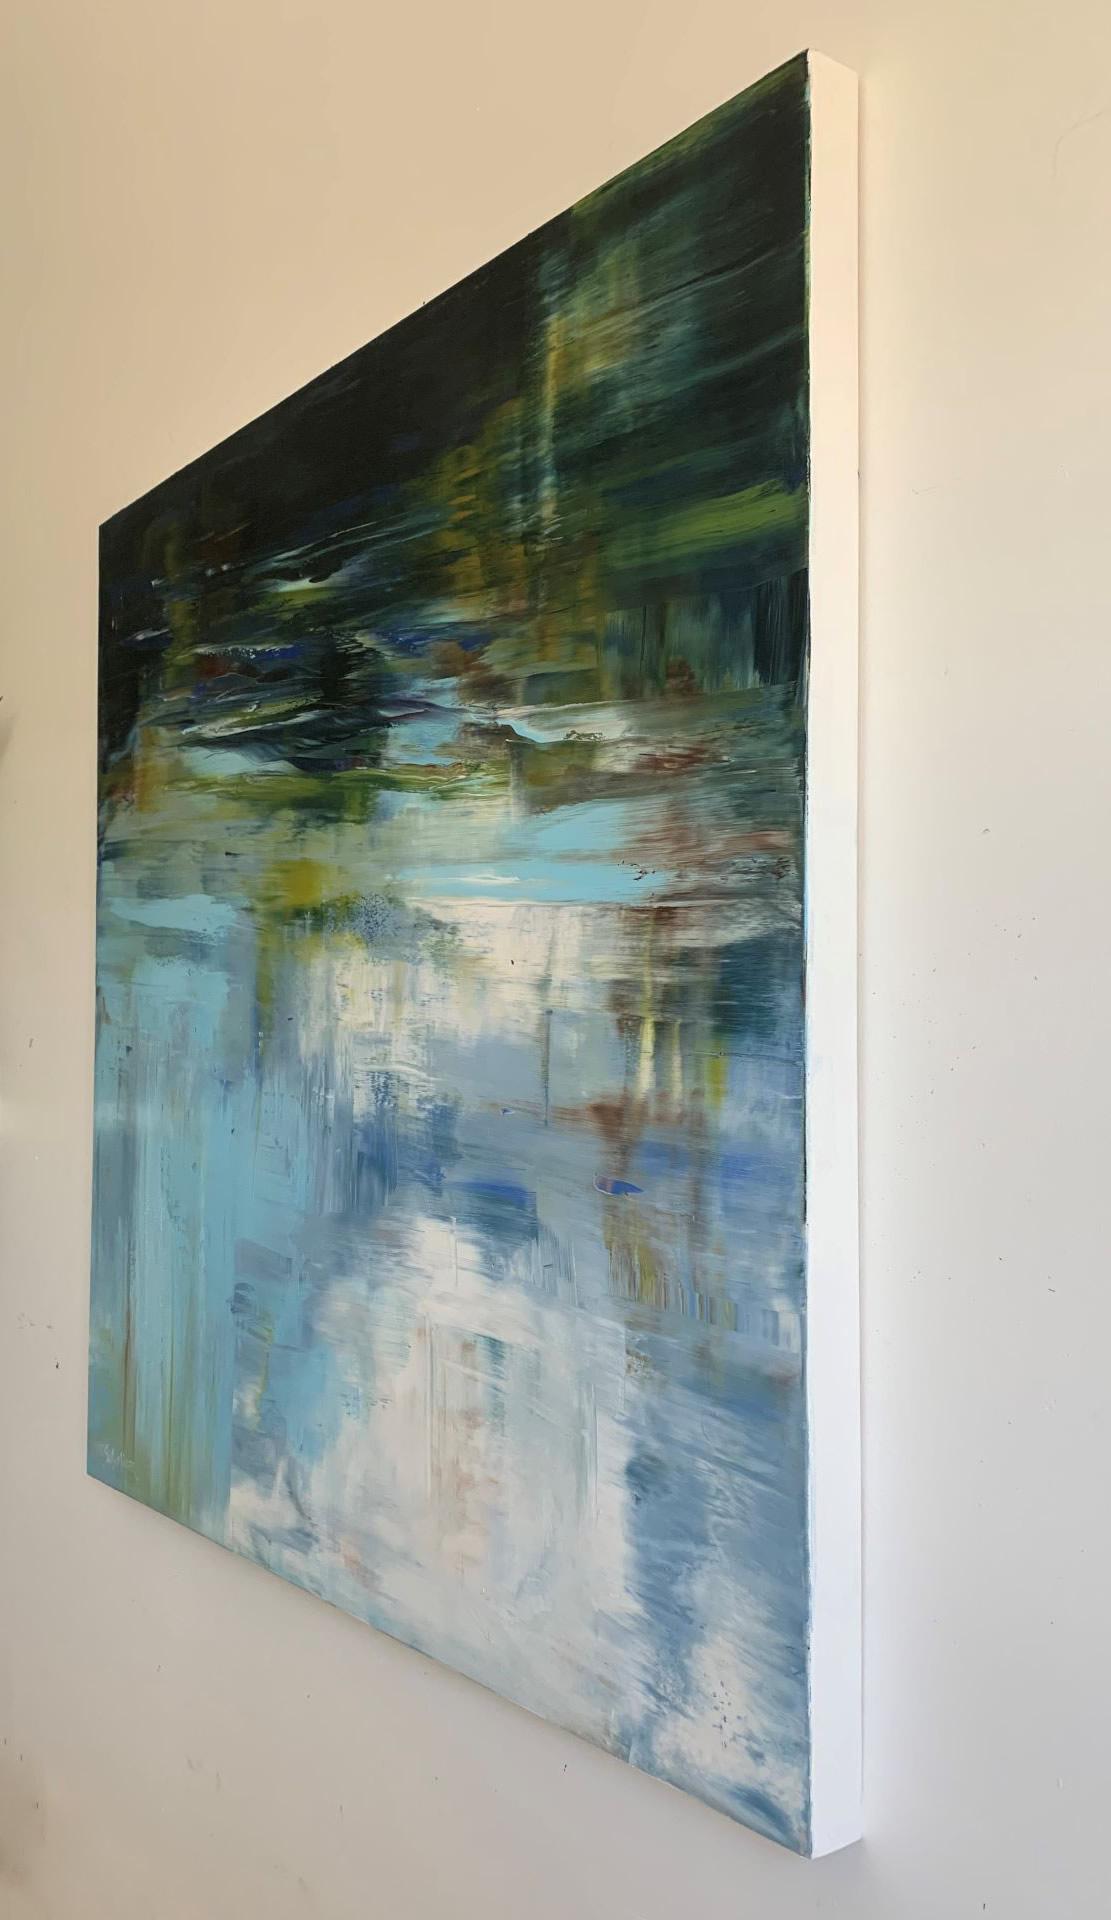 Sue-A-Miller-Speaking-Of-Summer-2021-Oil-On-Panel-36x36-3200-Side-Online-Art-Galleries